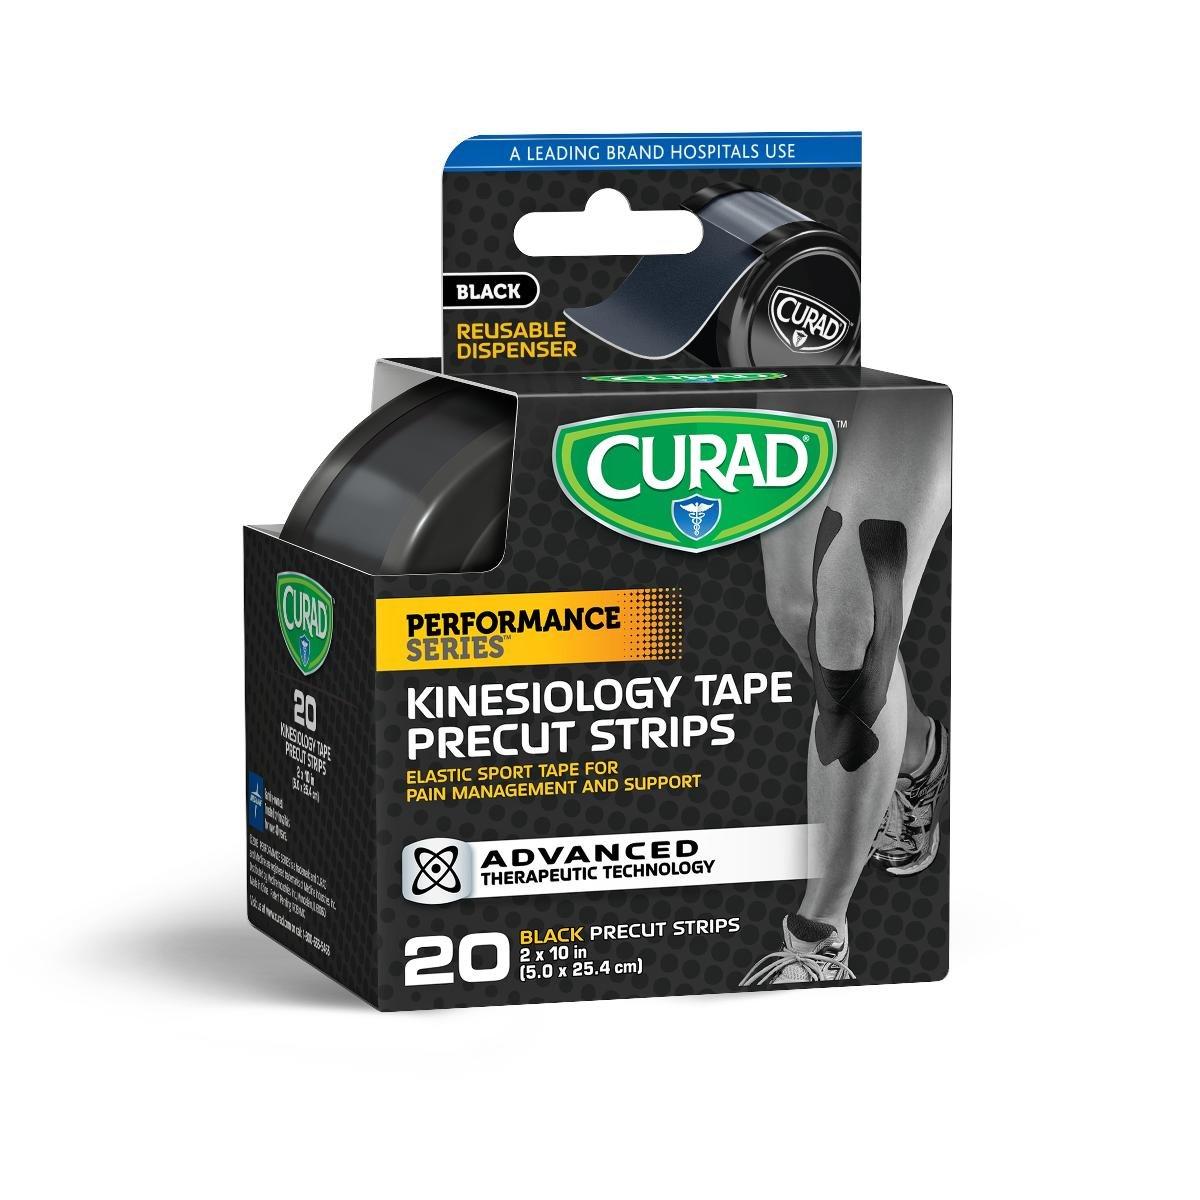 Performance Series Kinesiology Tape, 20 Precut Strips 2''X10'' (Black)